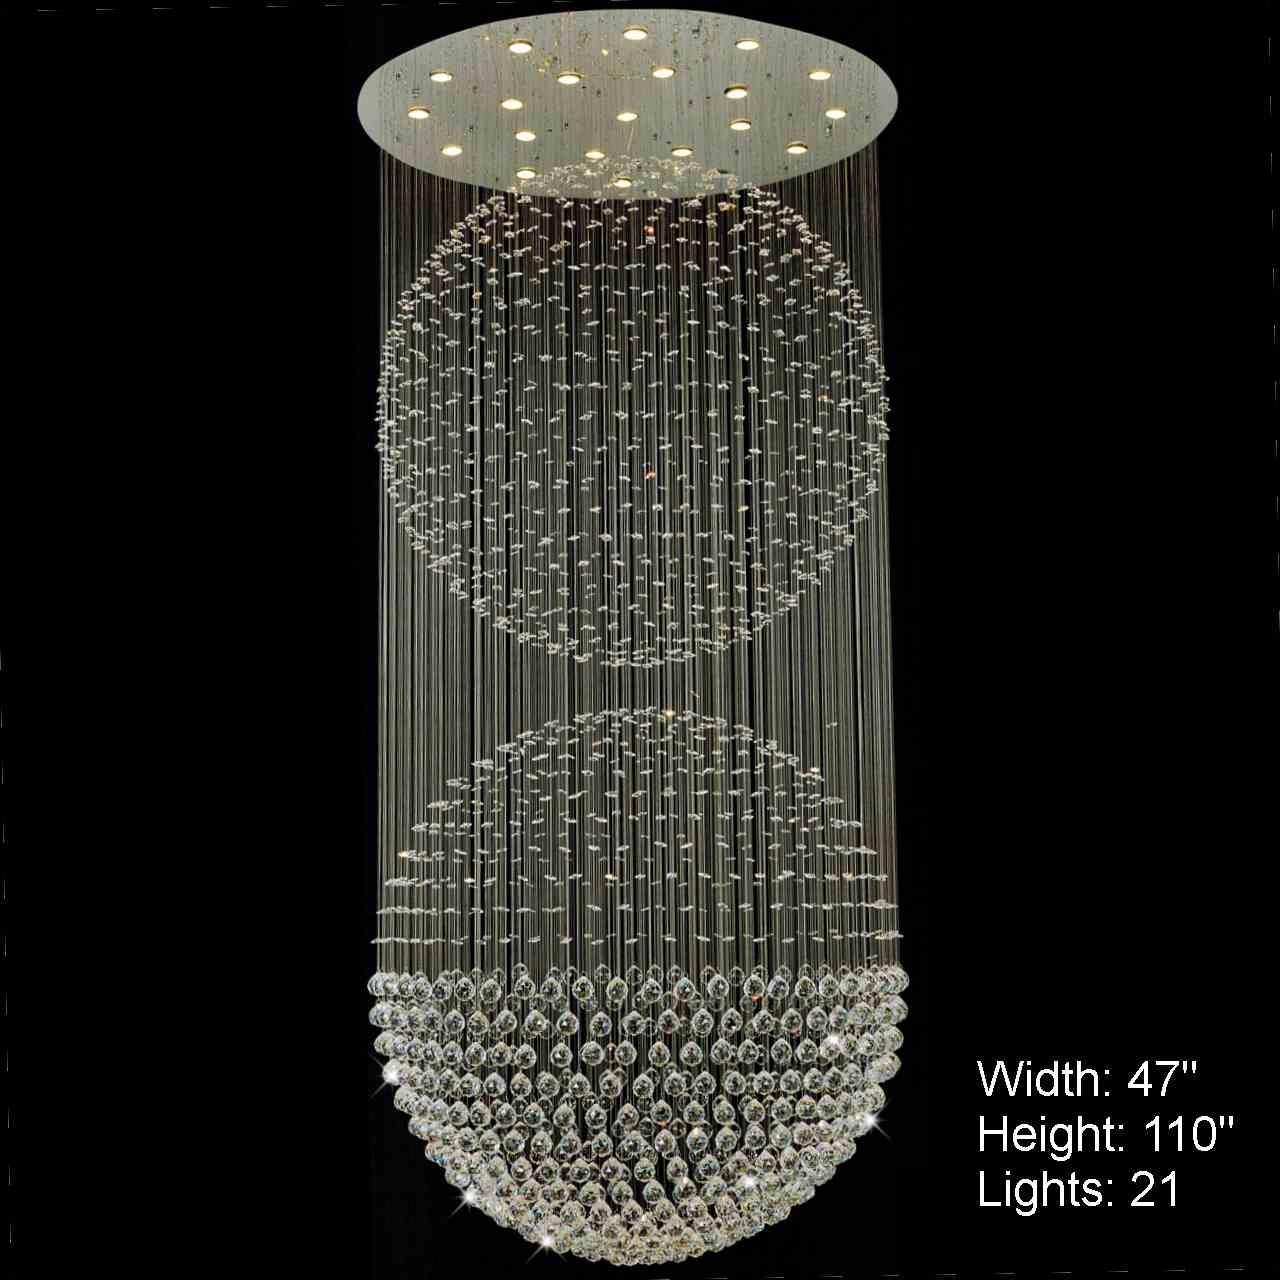 Modern Foyer Crystal Chandelier : Brizzo lighting stores double sphere modern foyer crystal